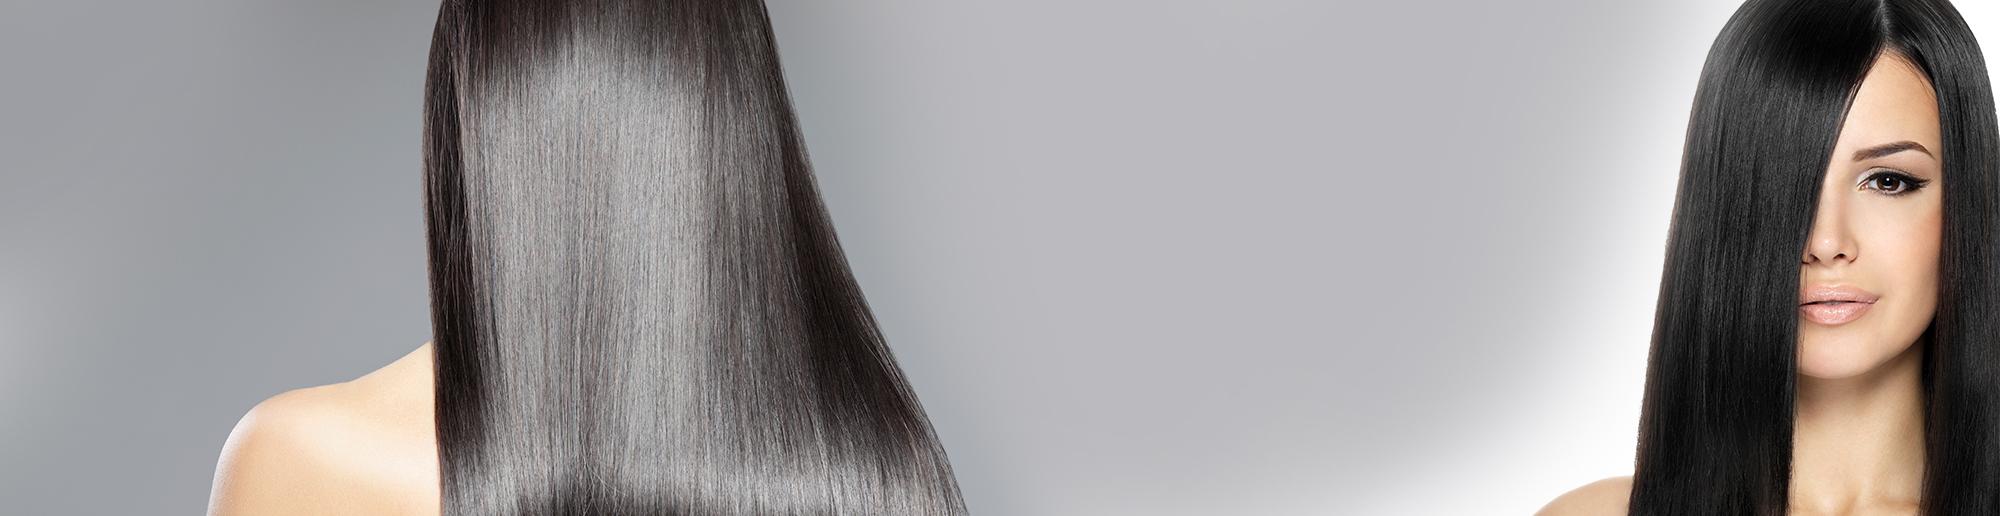 Hair straightening treatment in Brooklyn, New York